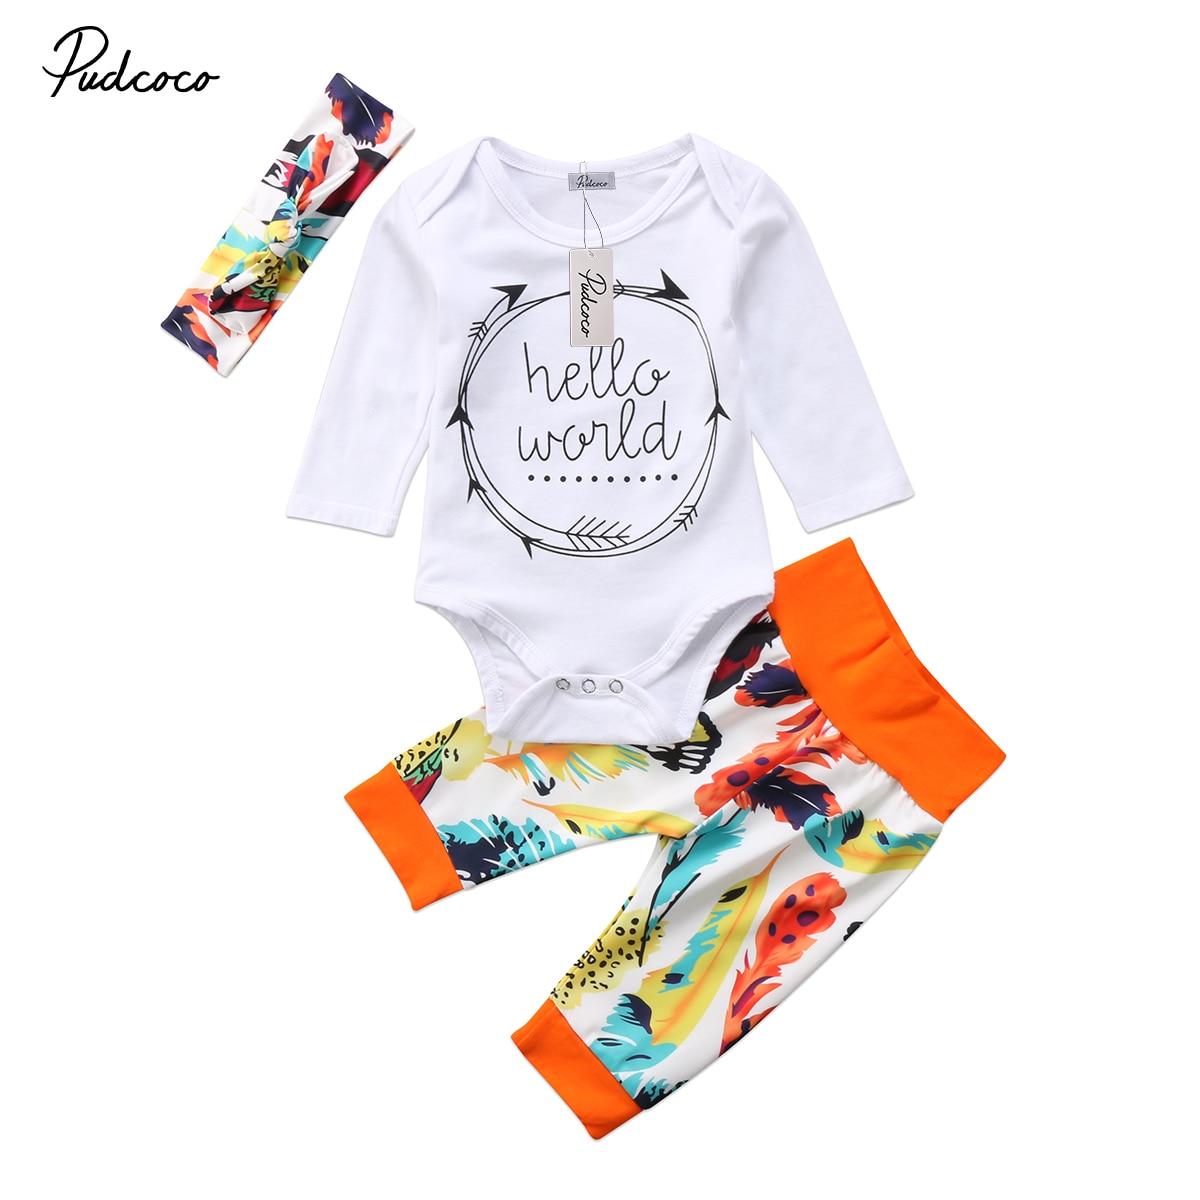 Friendly Pudcoco Newborn Baby Girl Short Sleeve Watermelon Print T Shirt Clothes Tops shorts Kids Girls Summer 3pcs Outfit Set Girls' Baby Clothing